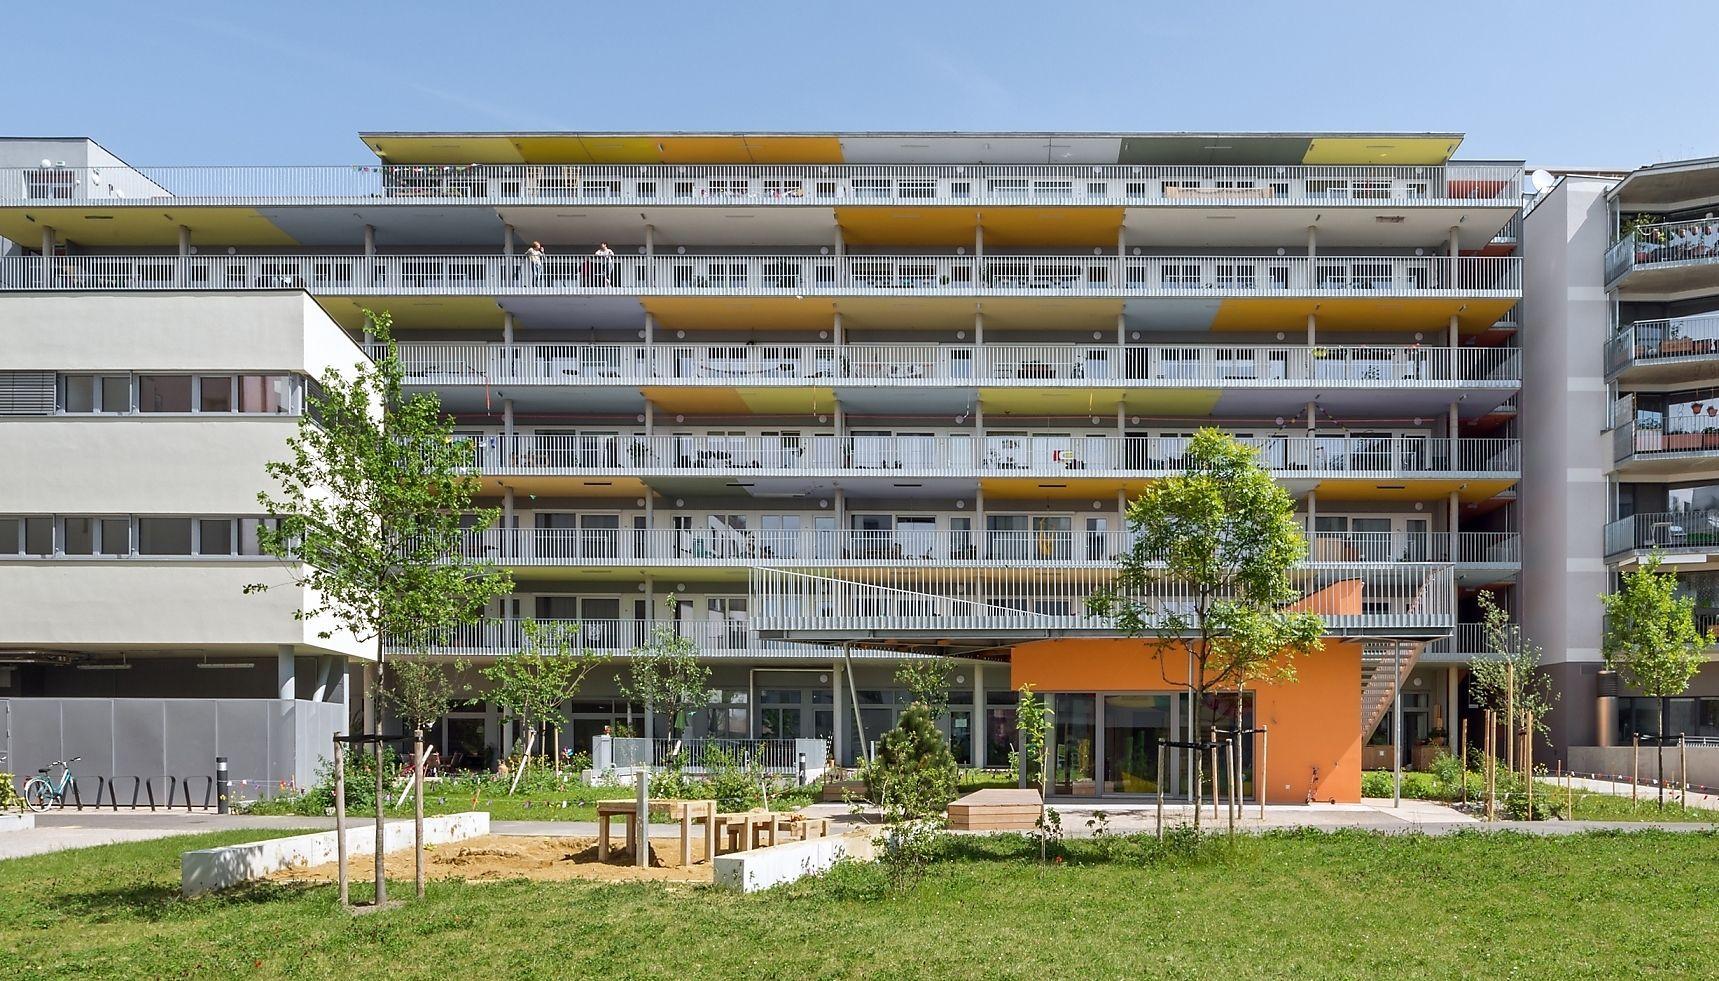 Baugruppen-Projekt LiSA in der Seestadt Aspern.